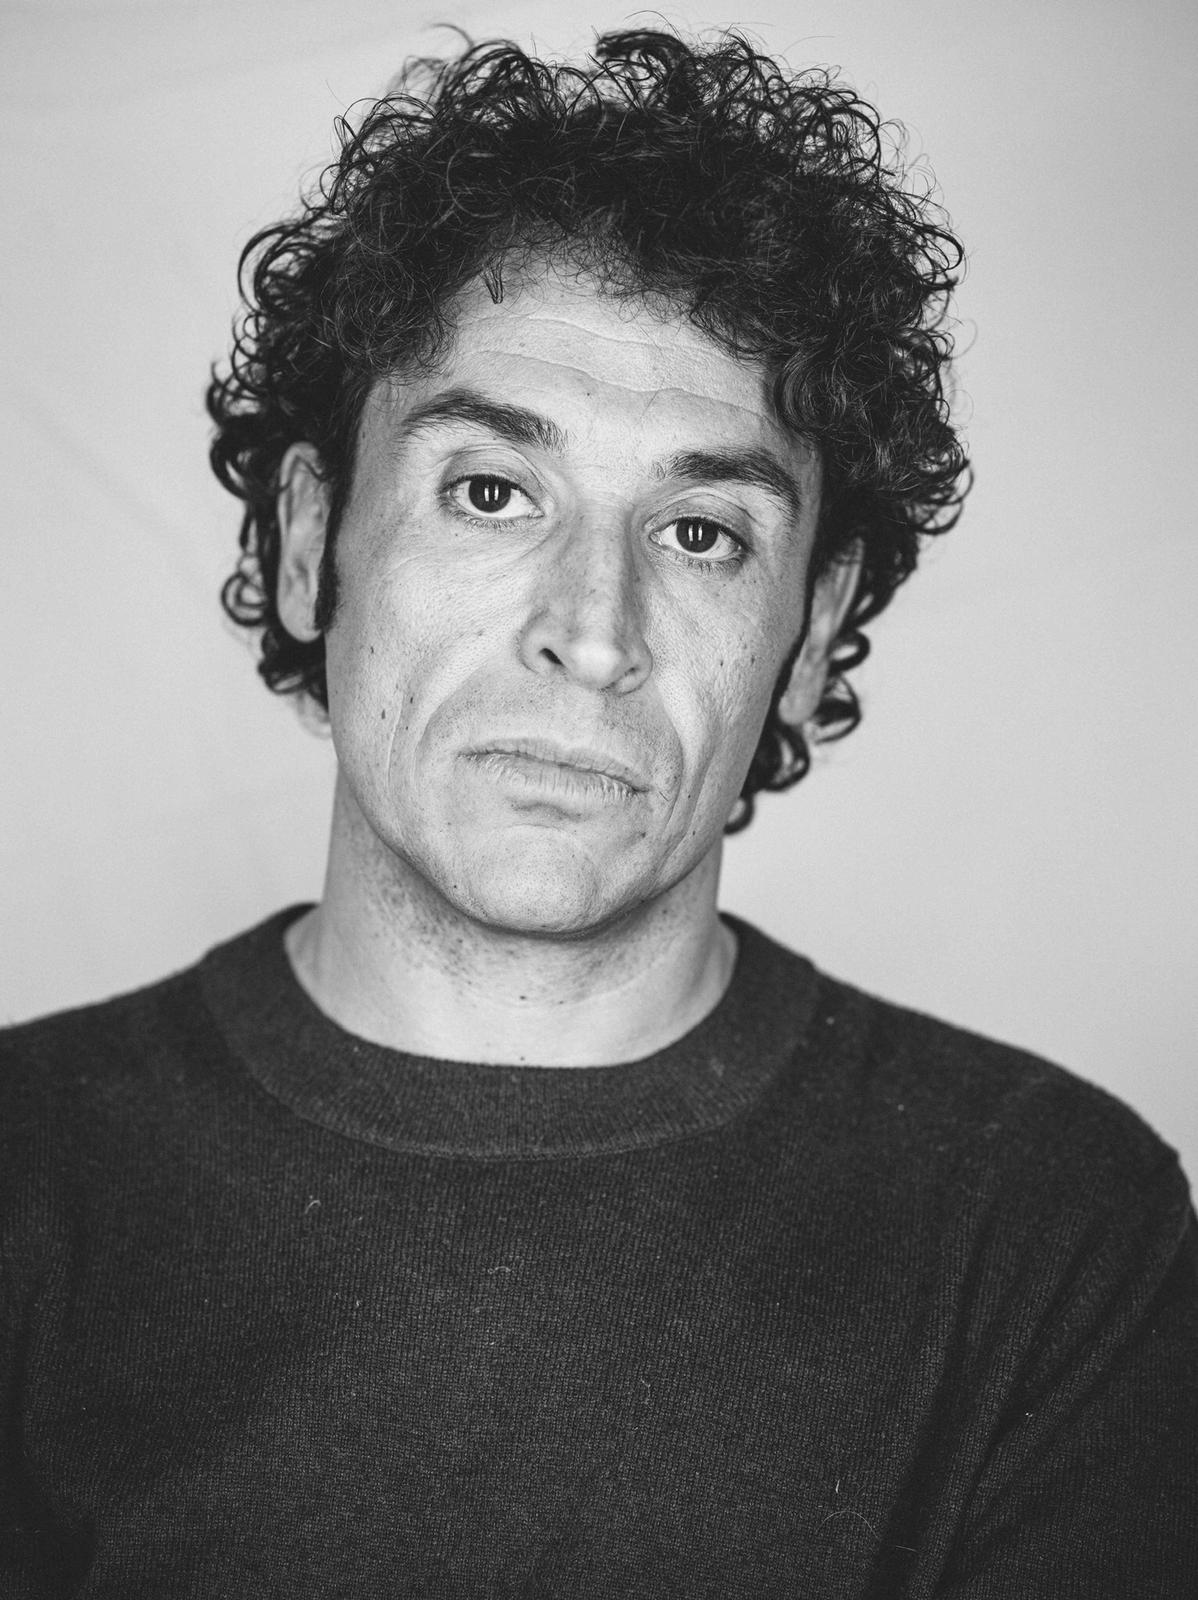 Giorgio Galimberti Portrait by Max & Douglas